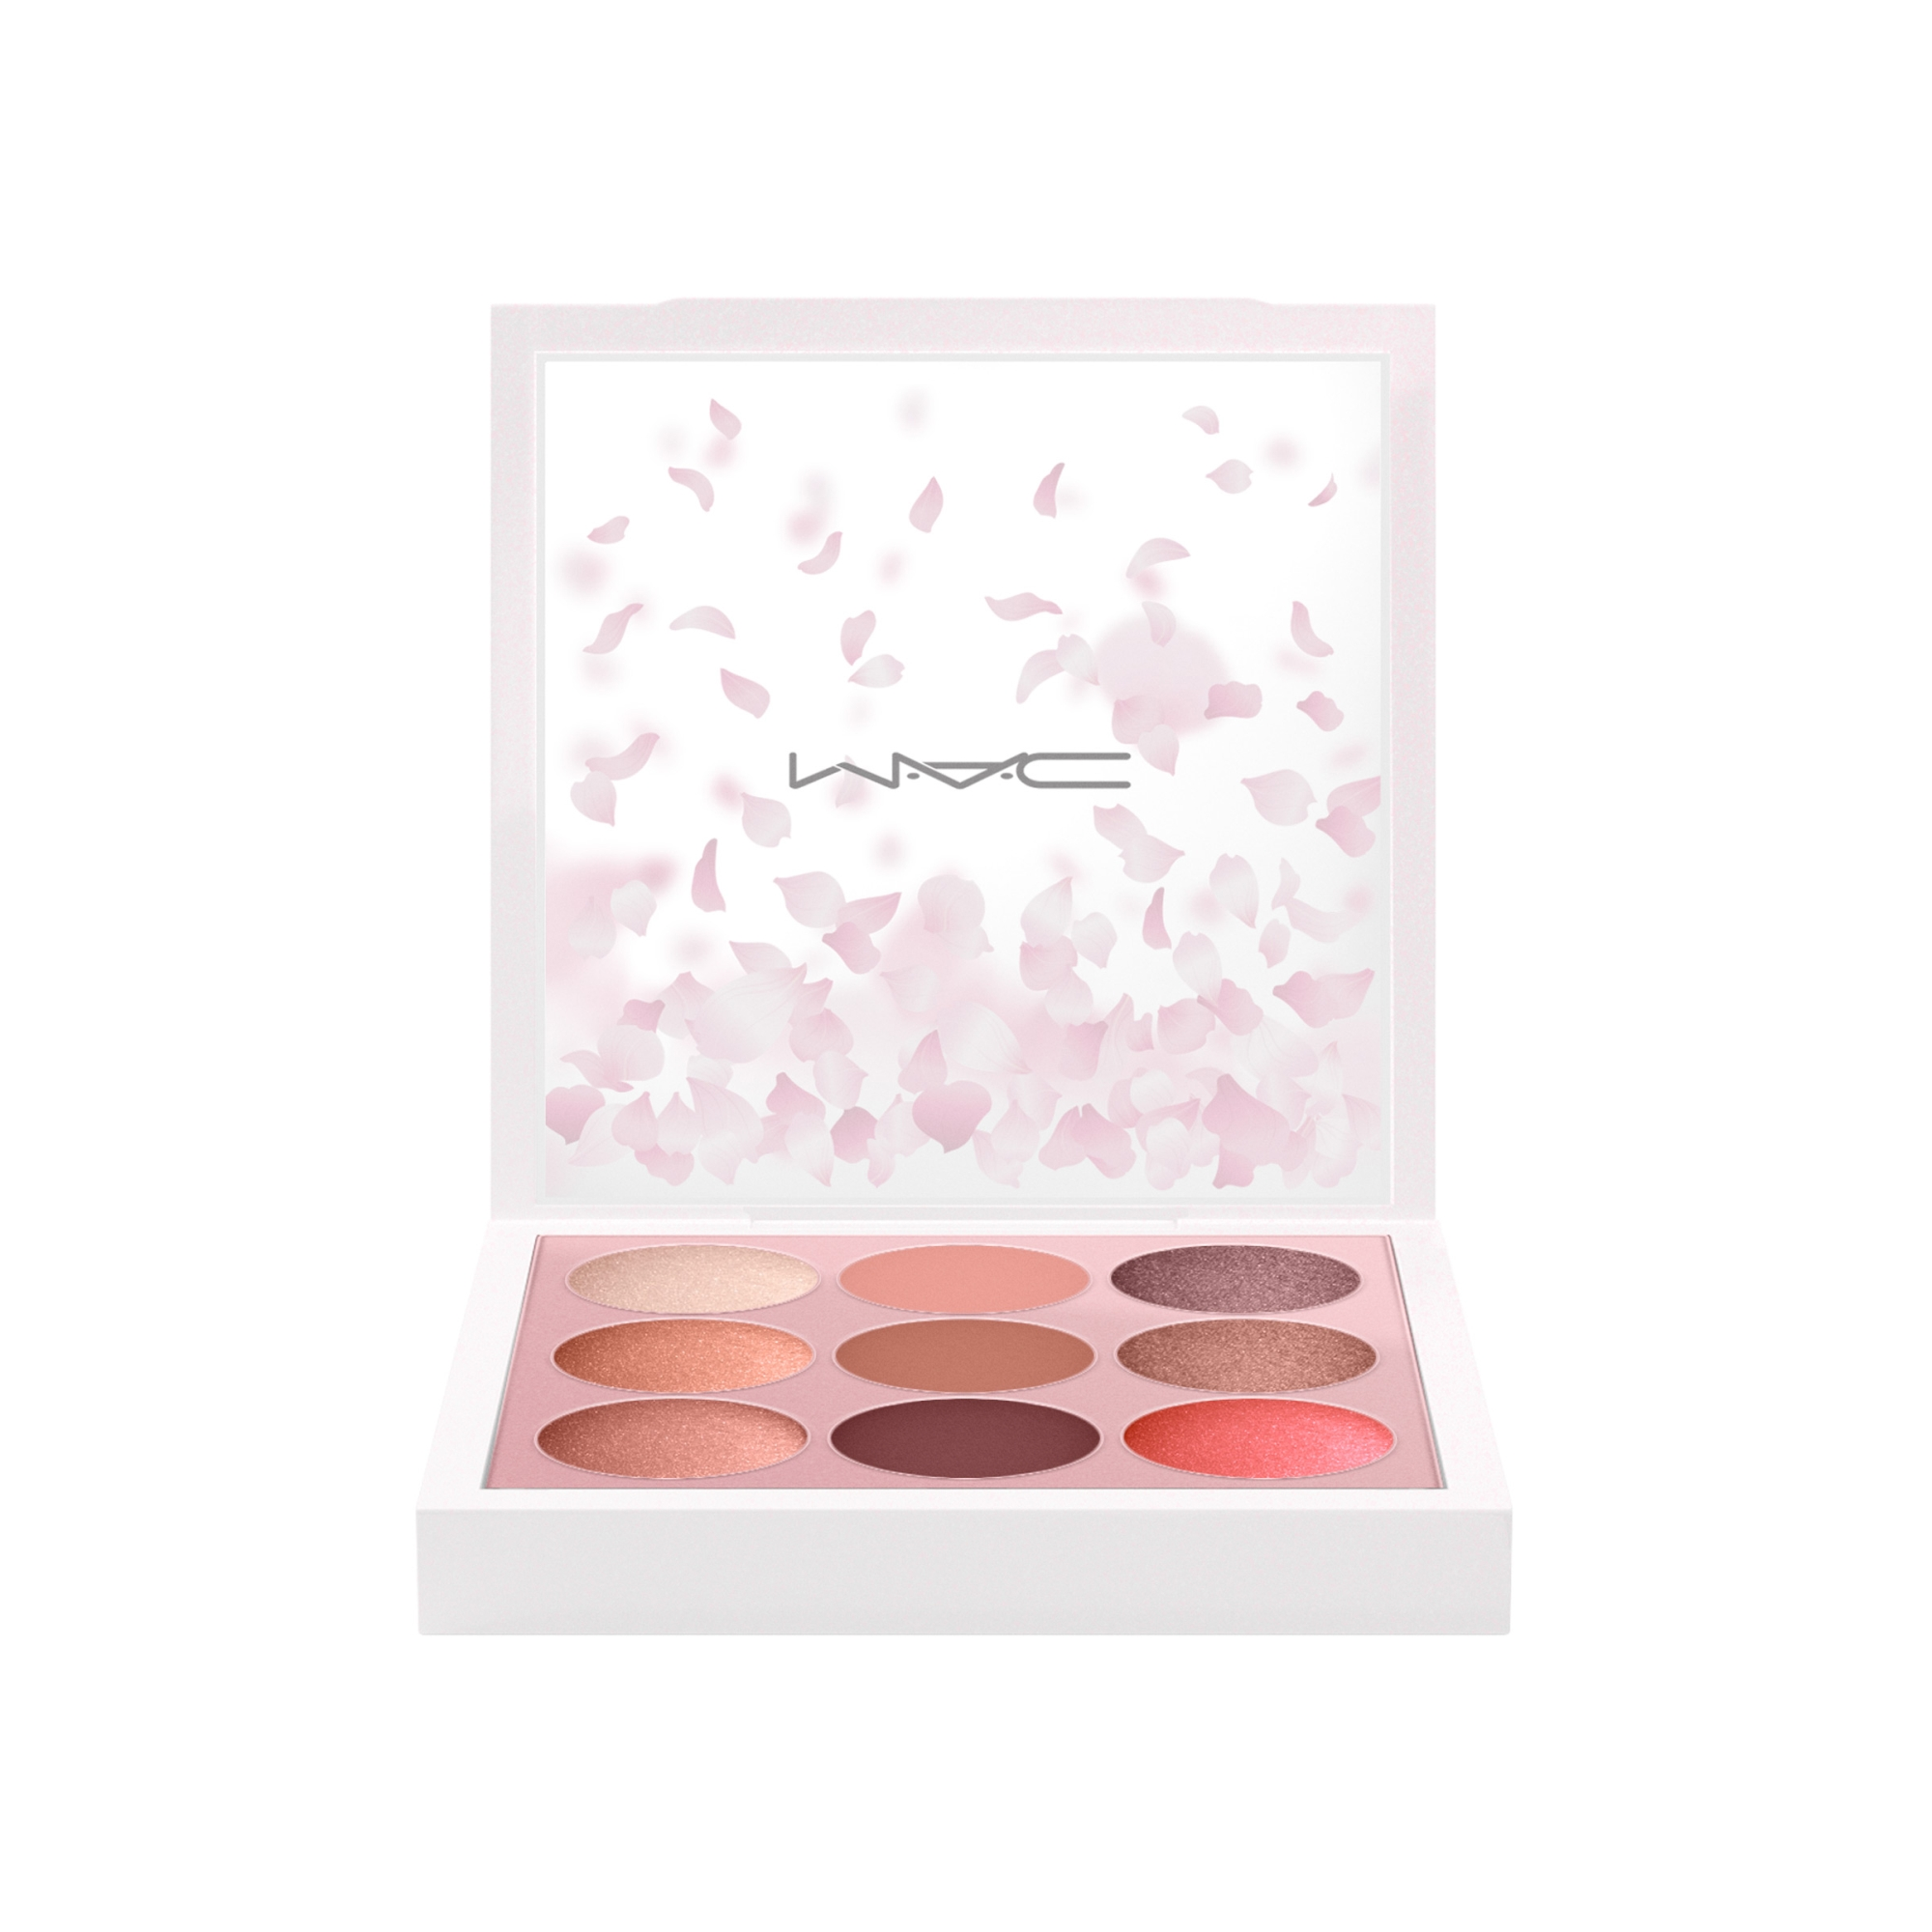 Eye Shadow X9/Cherry Blossom Palette 01-WN